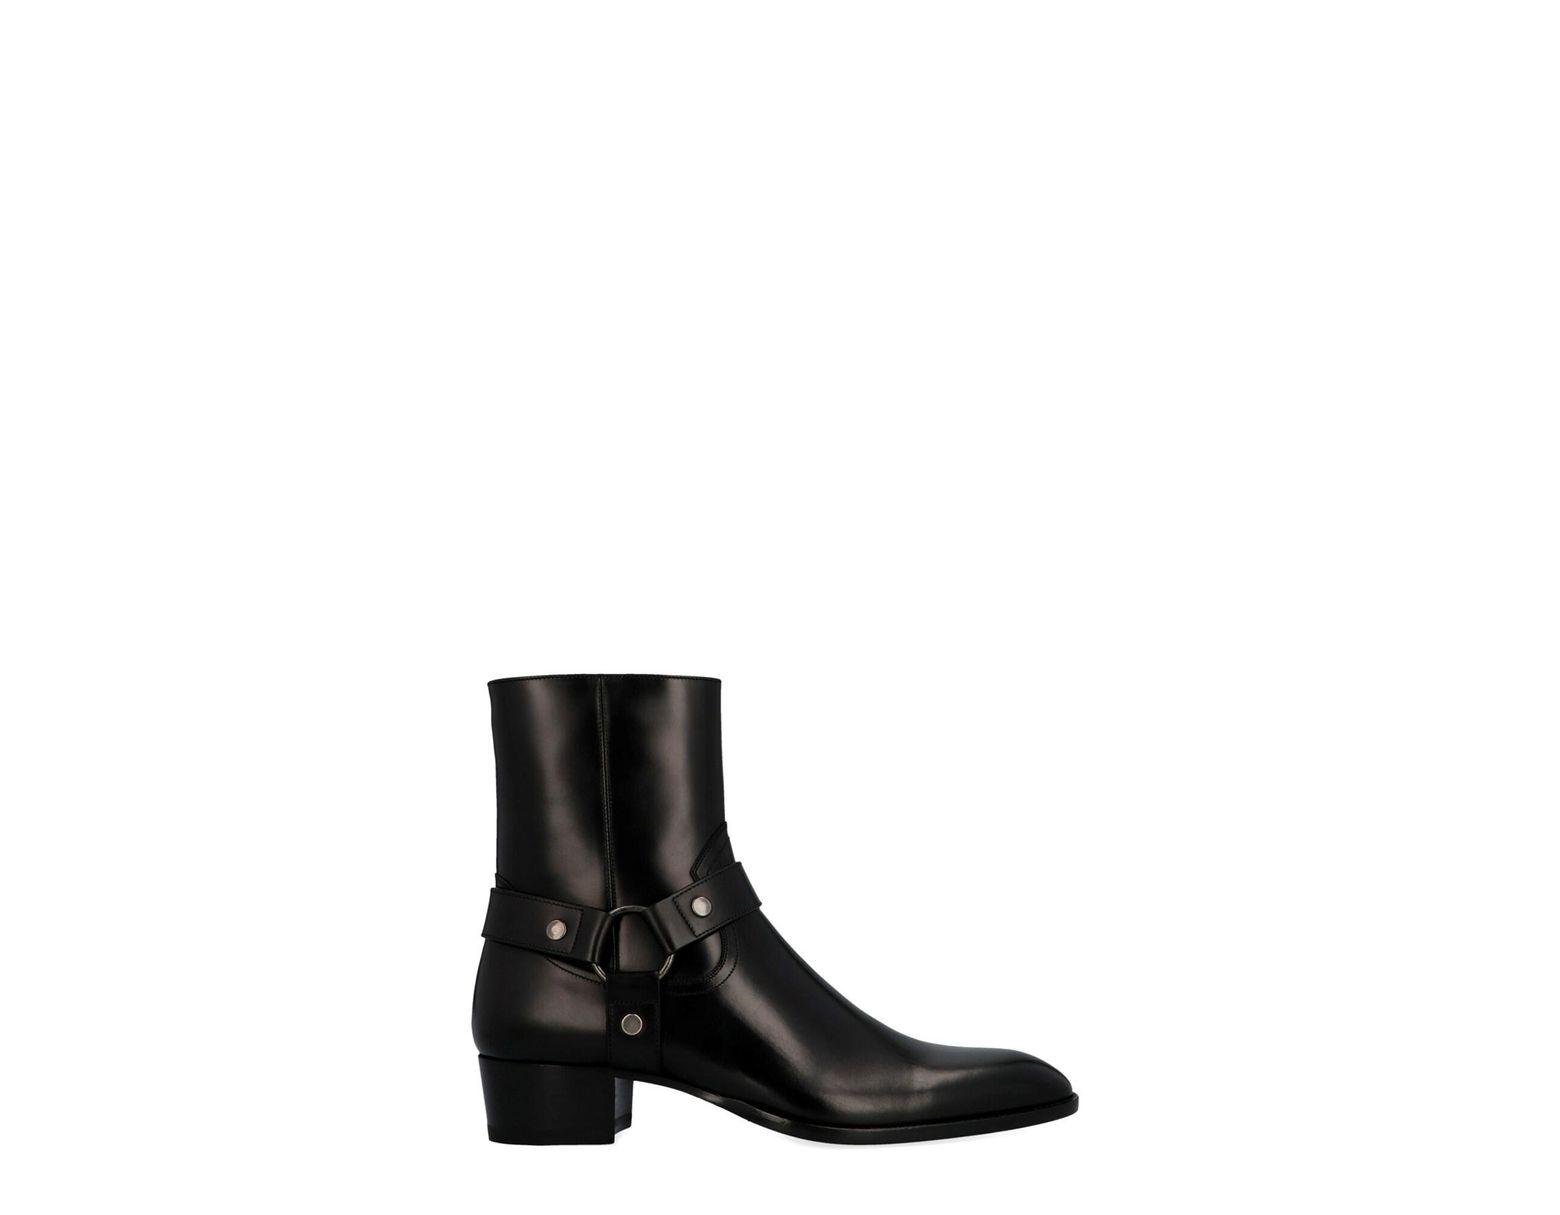 368318b5d81 Men's Black 'wyatt Harness' Ankle Boots